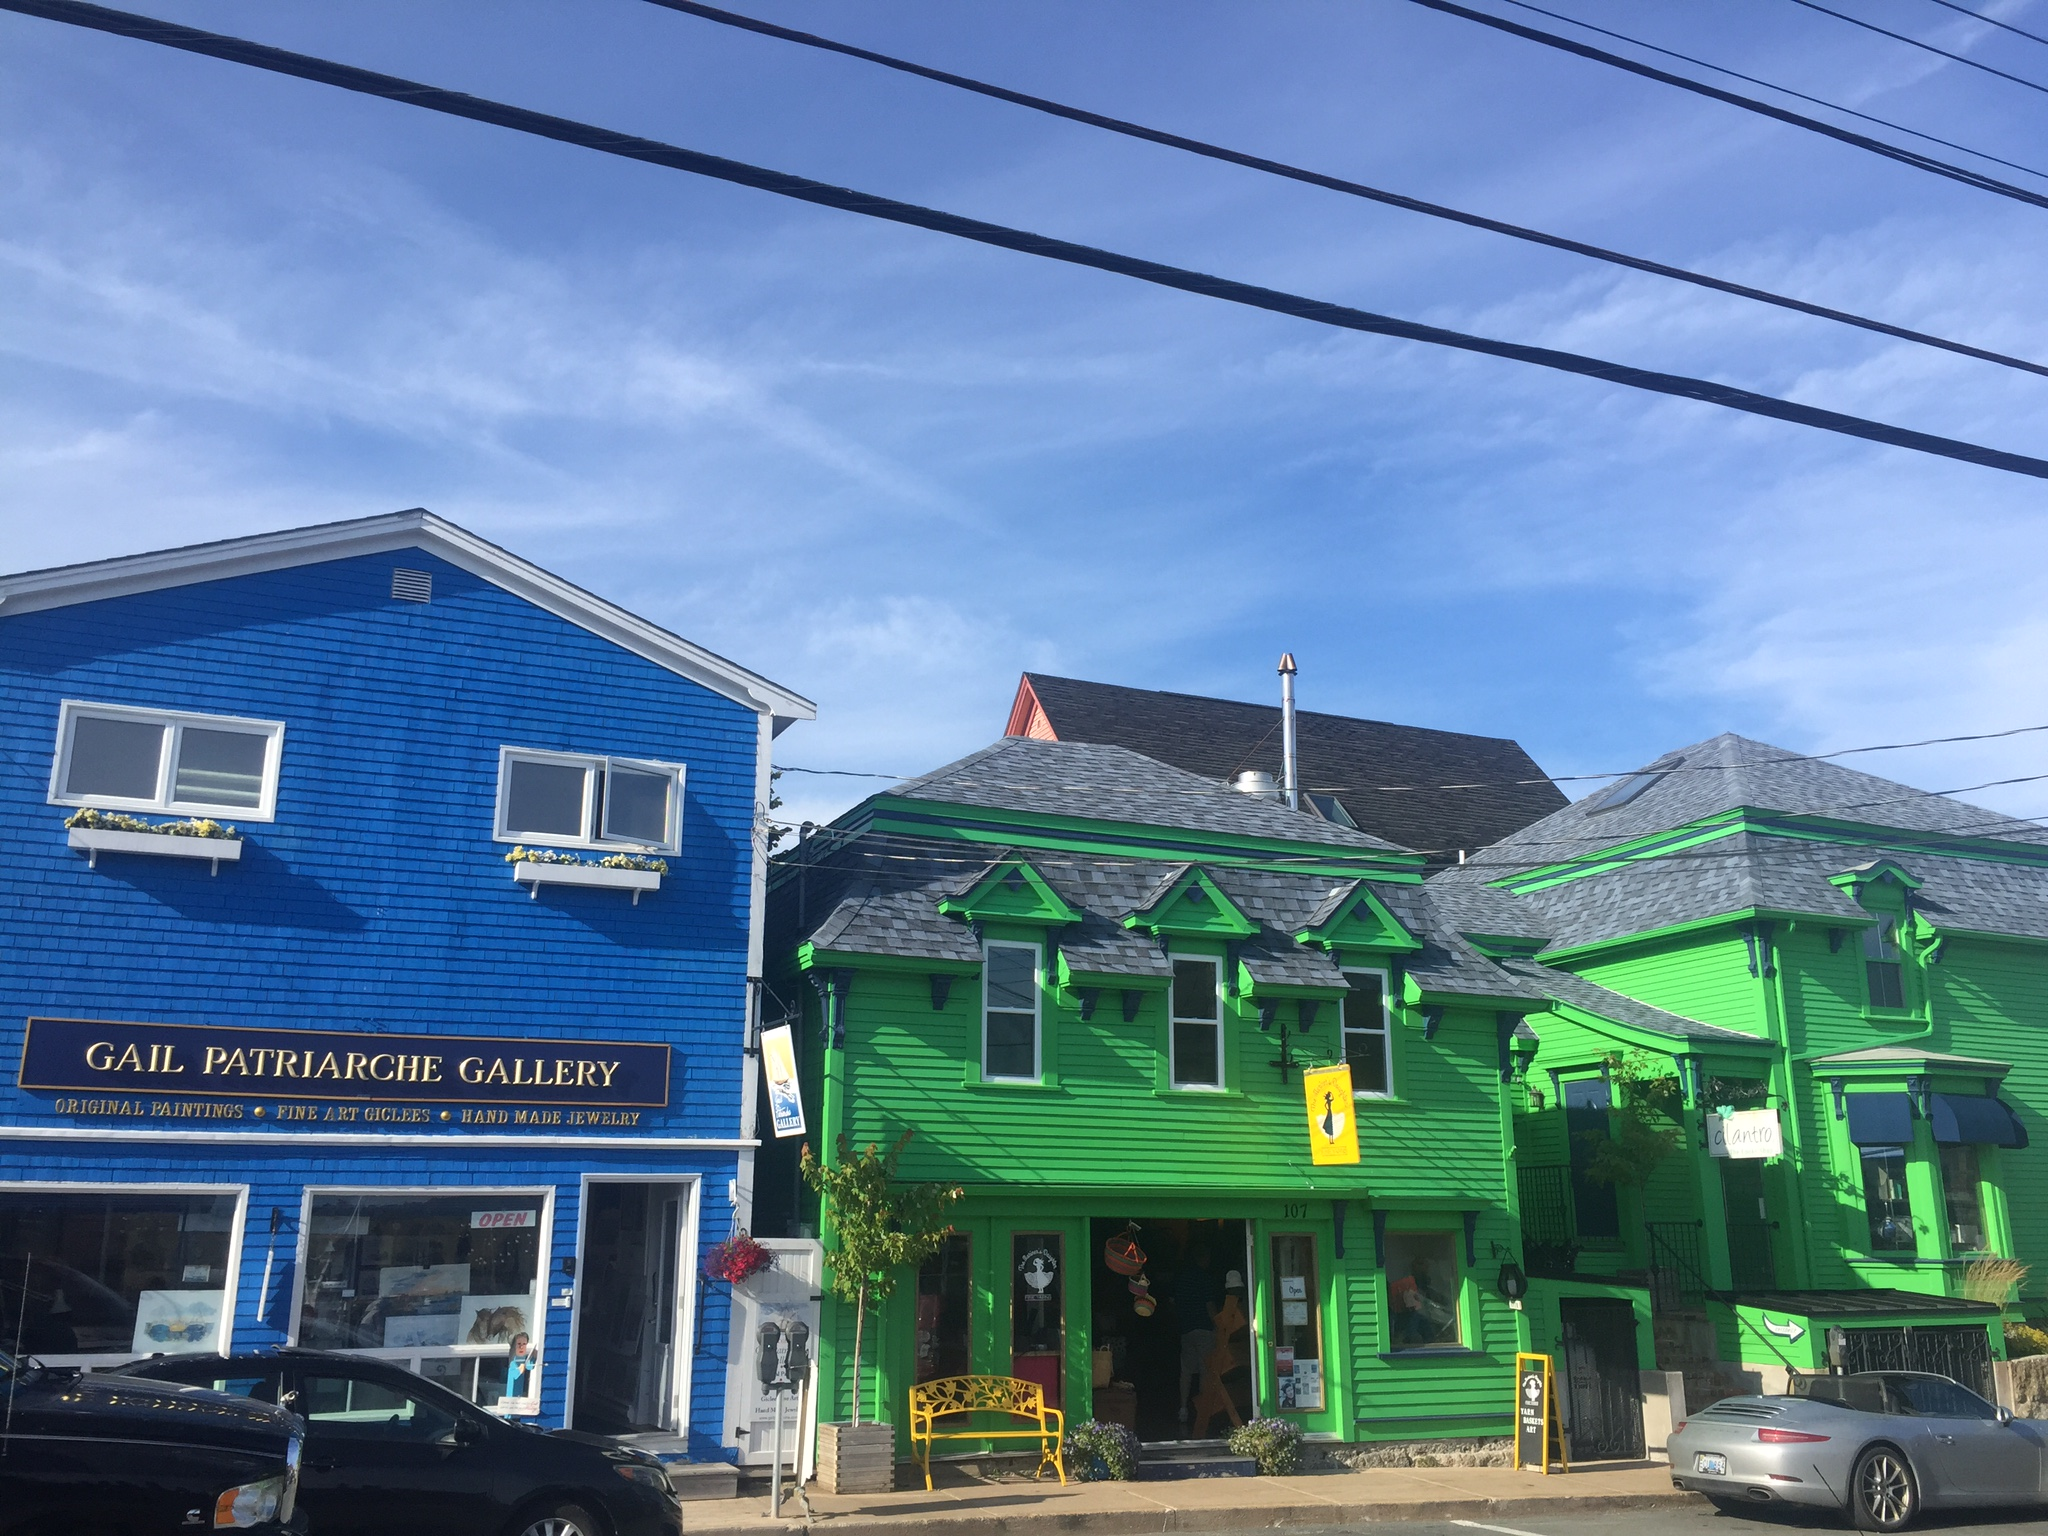 Downtown Lunenberg, Nova Scotia